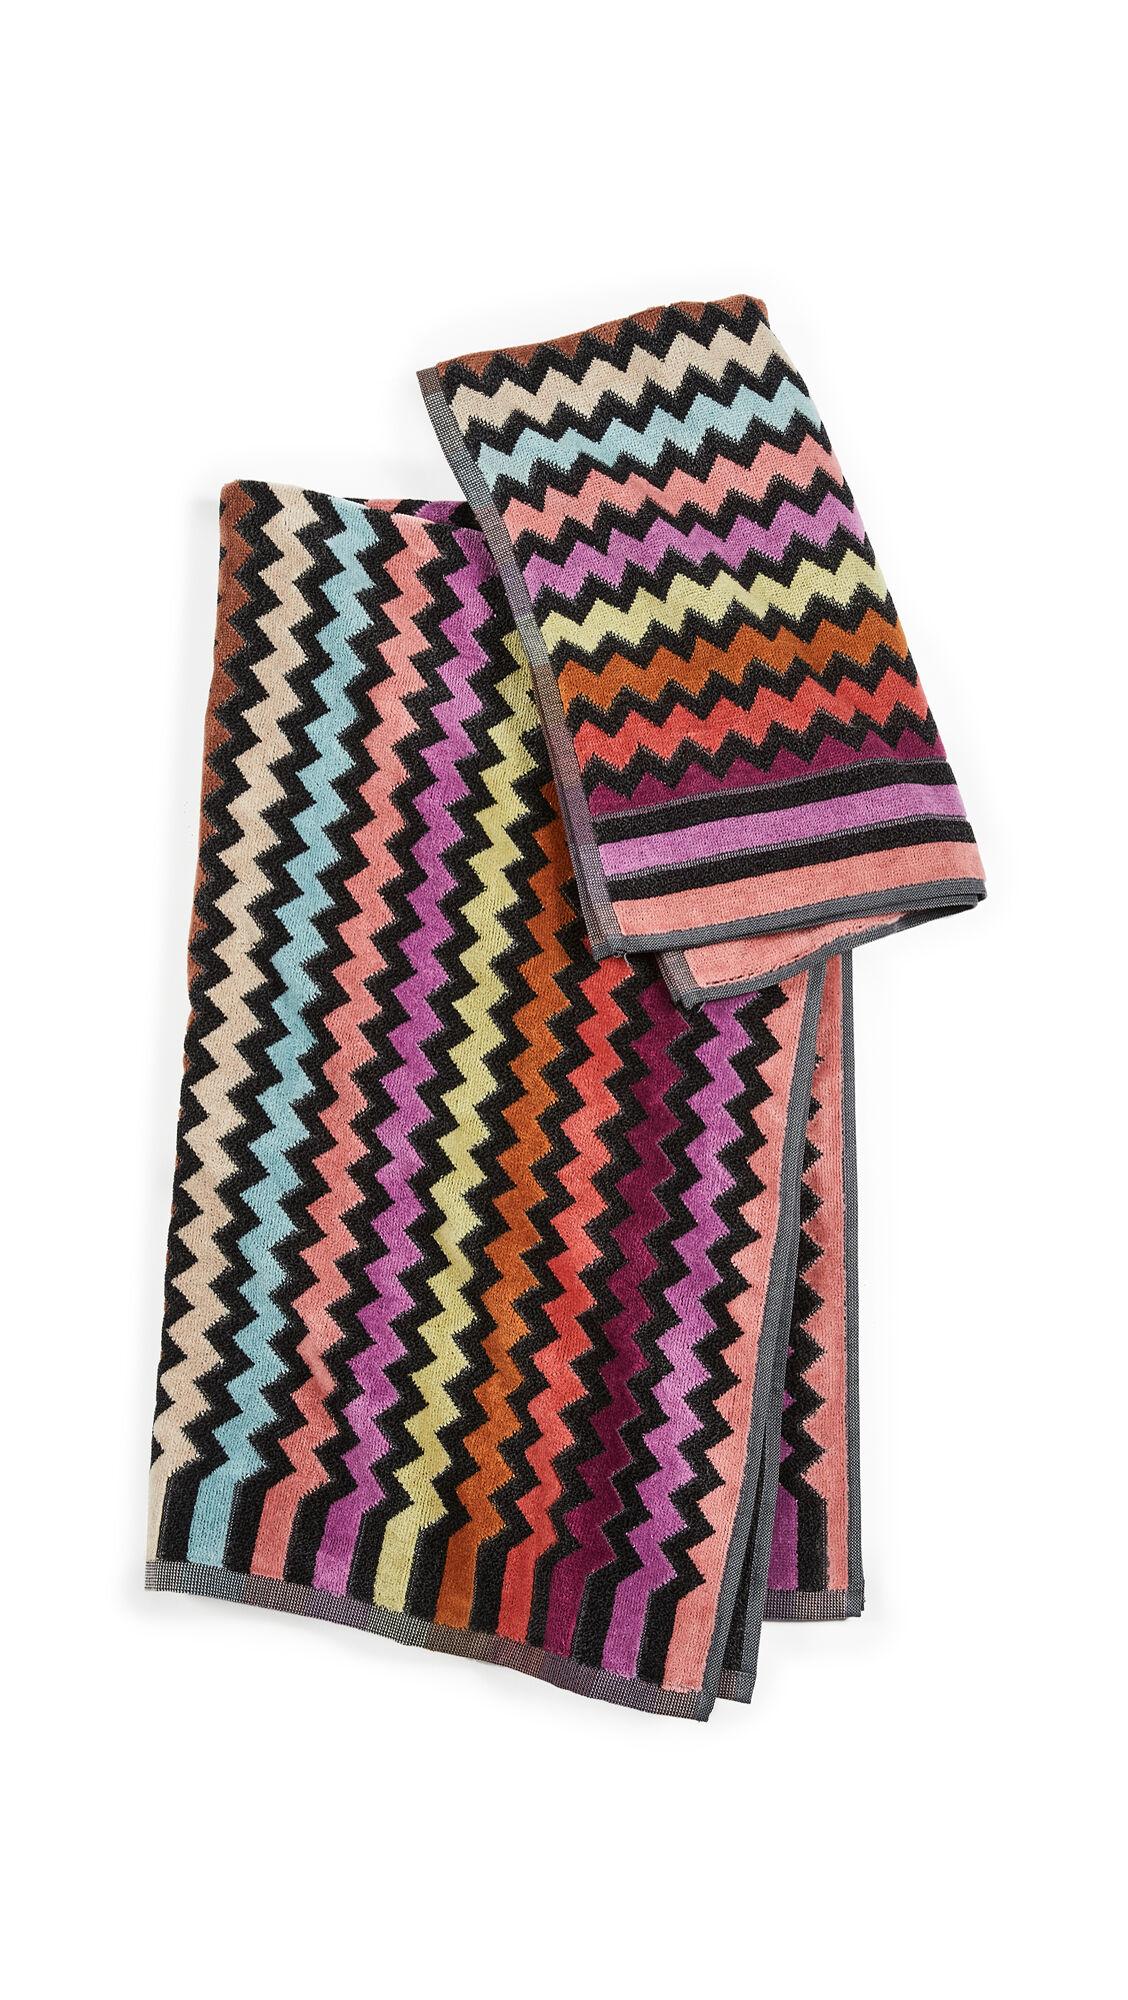 Missoni Home 159 Warner 2 Piece Towel Set  - 159 Warner - Size: One Size